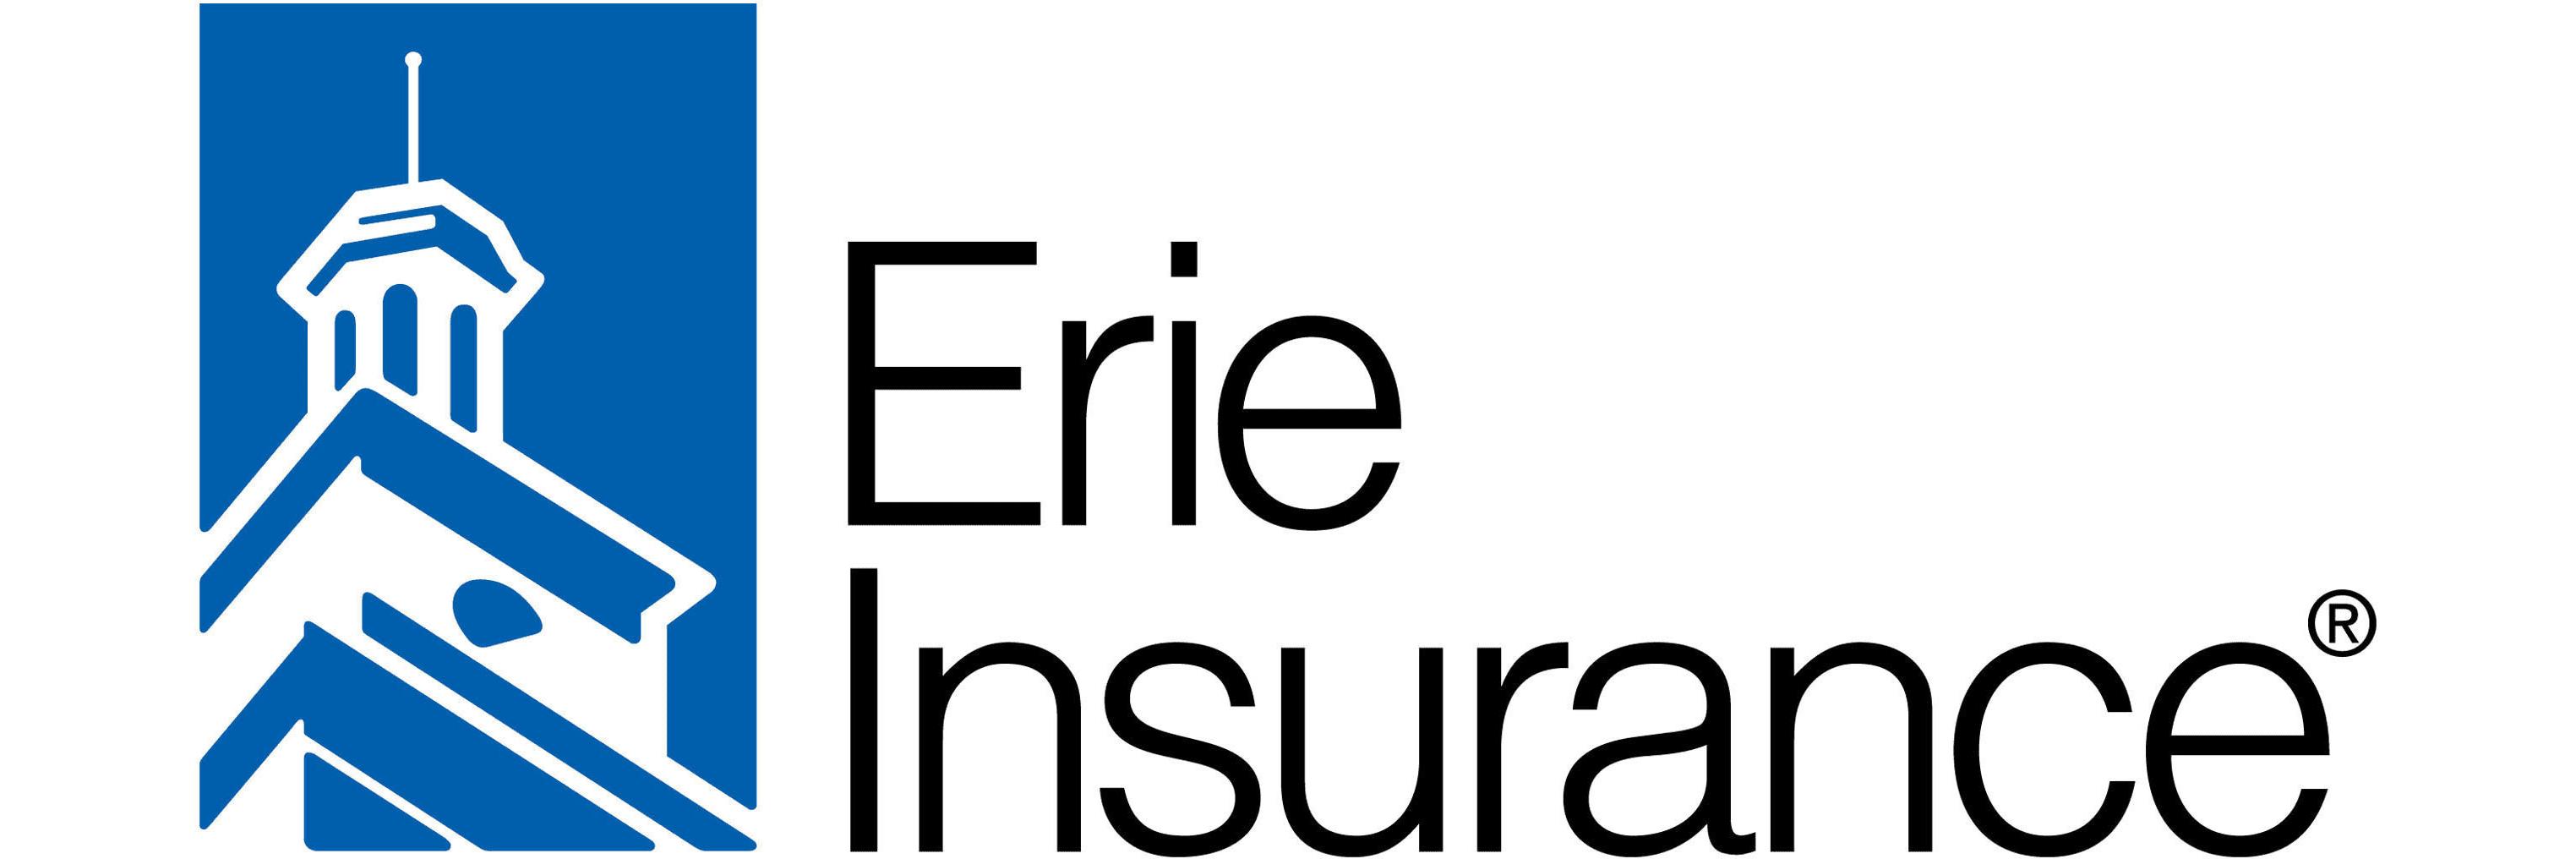 Best Car Insurance Companies Of August 2020